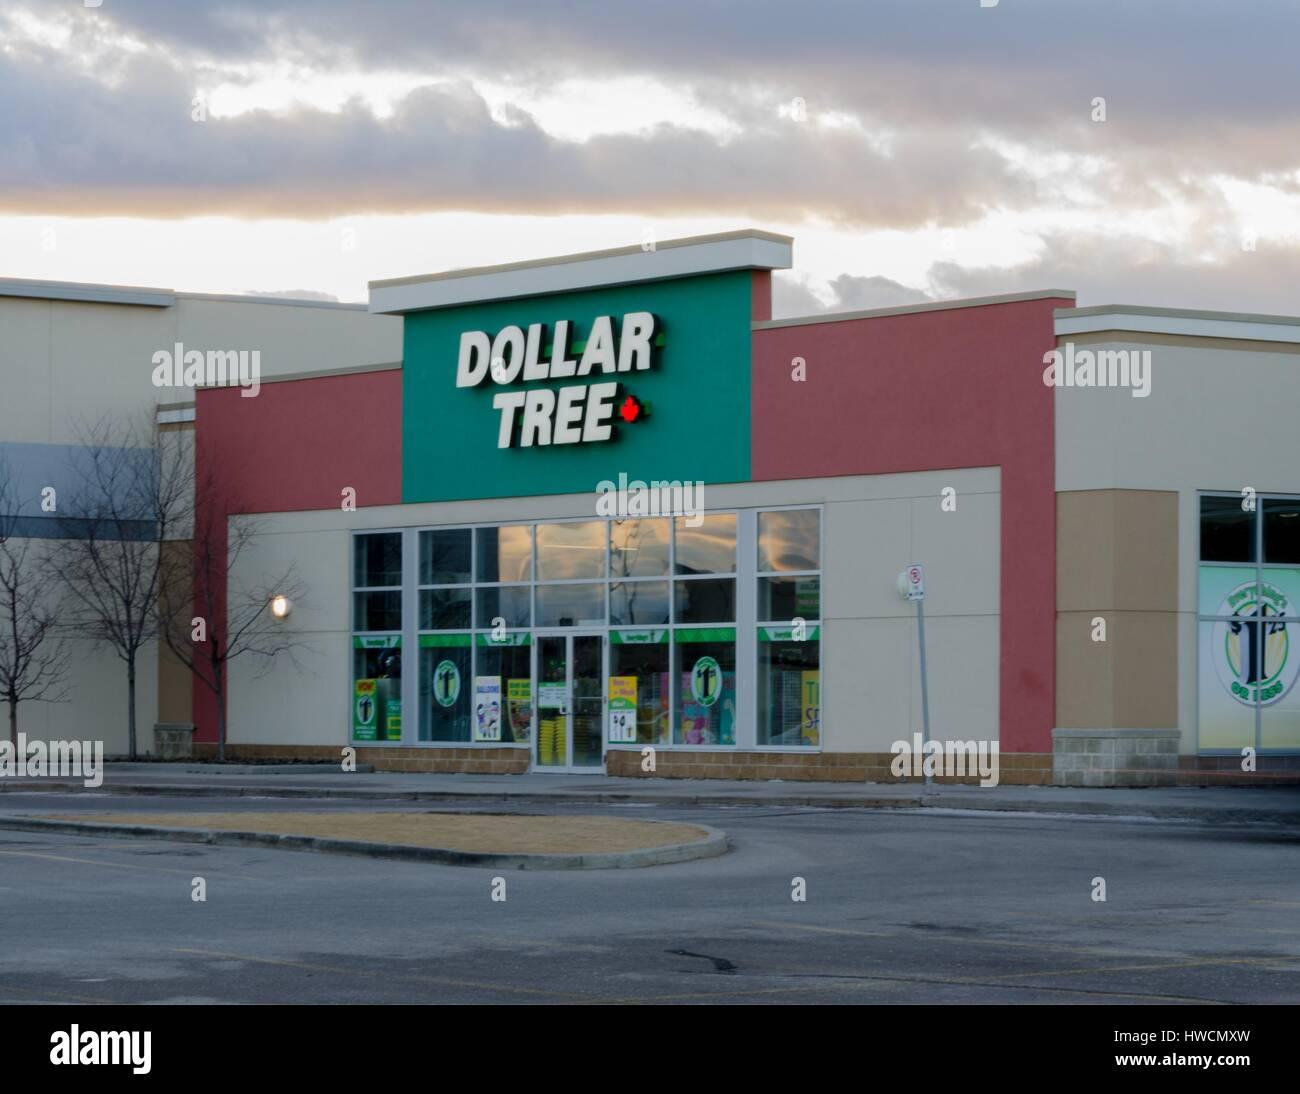 A Dollar Tree Retail Store In Calgary, Alberta, Canada